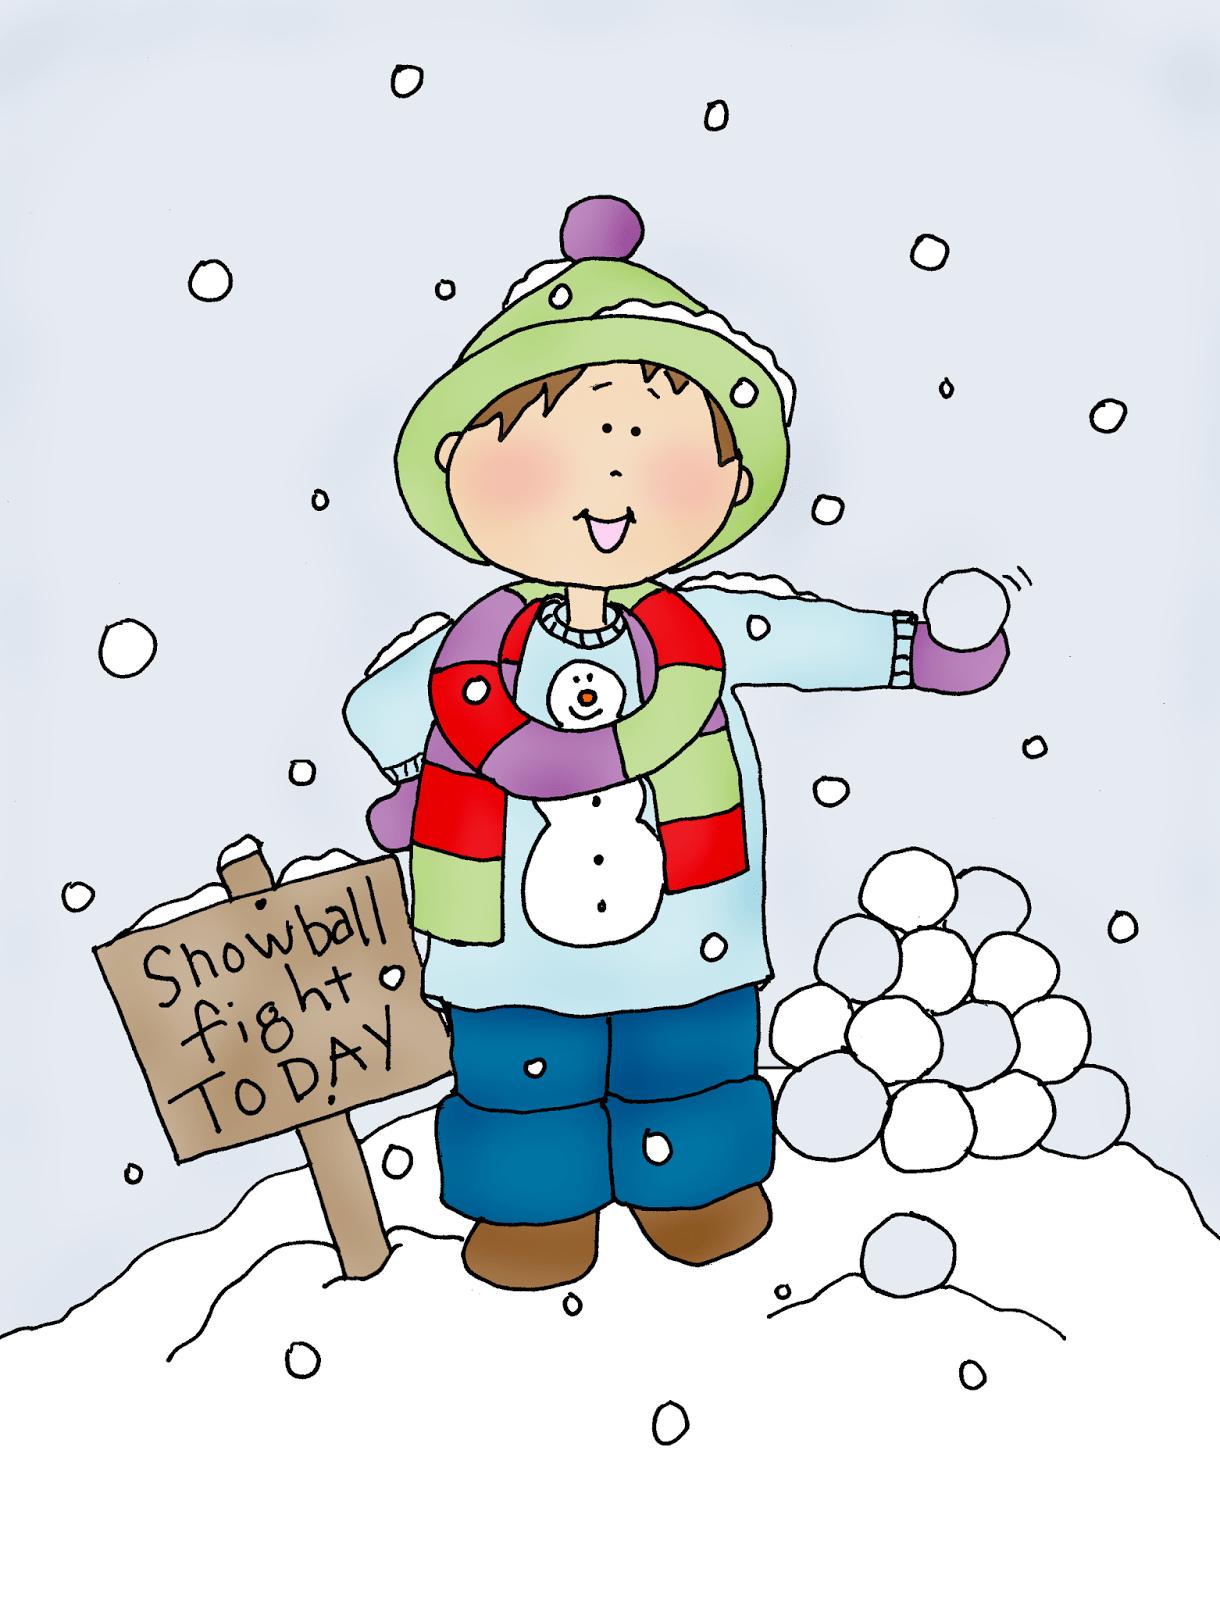 Free clipart snowball fight. Portal